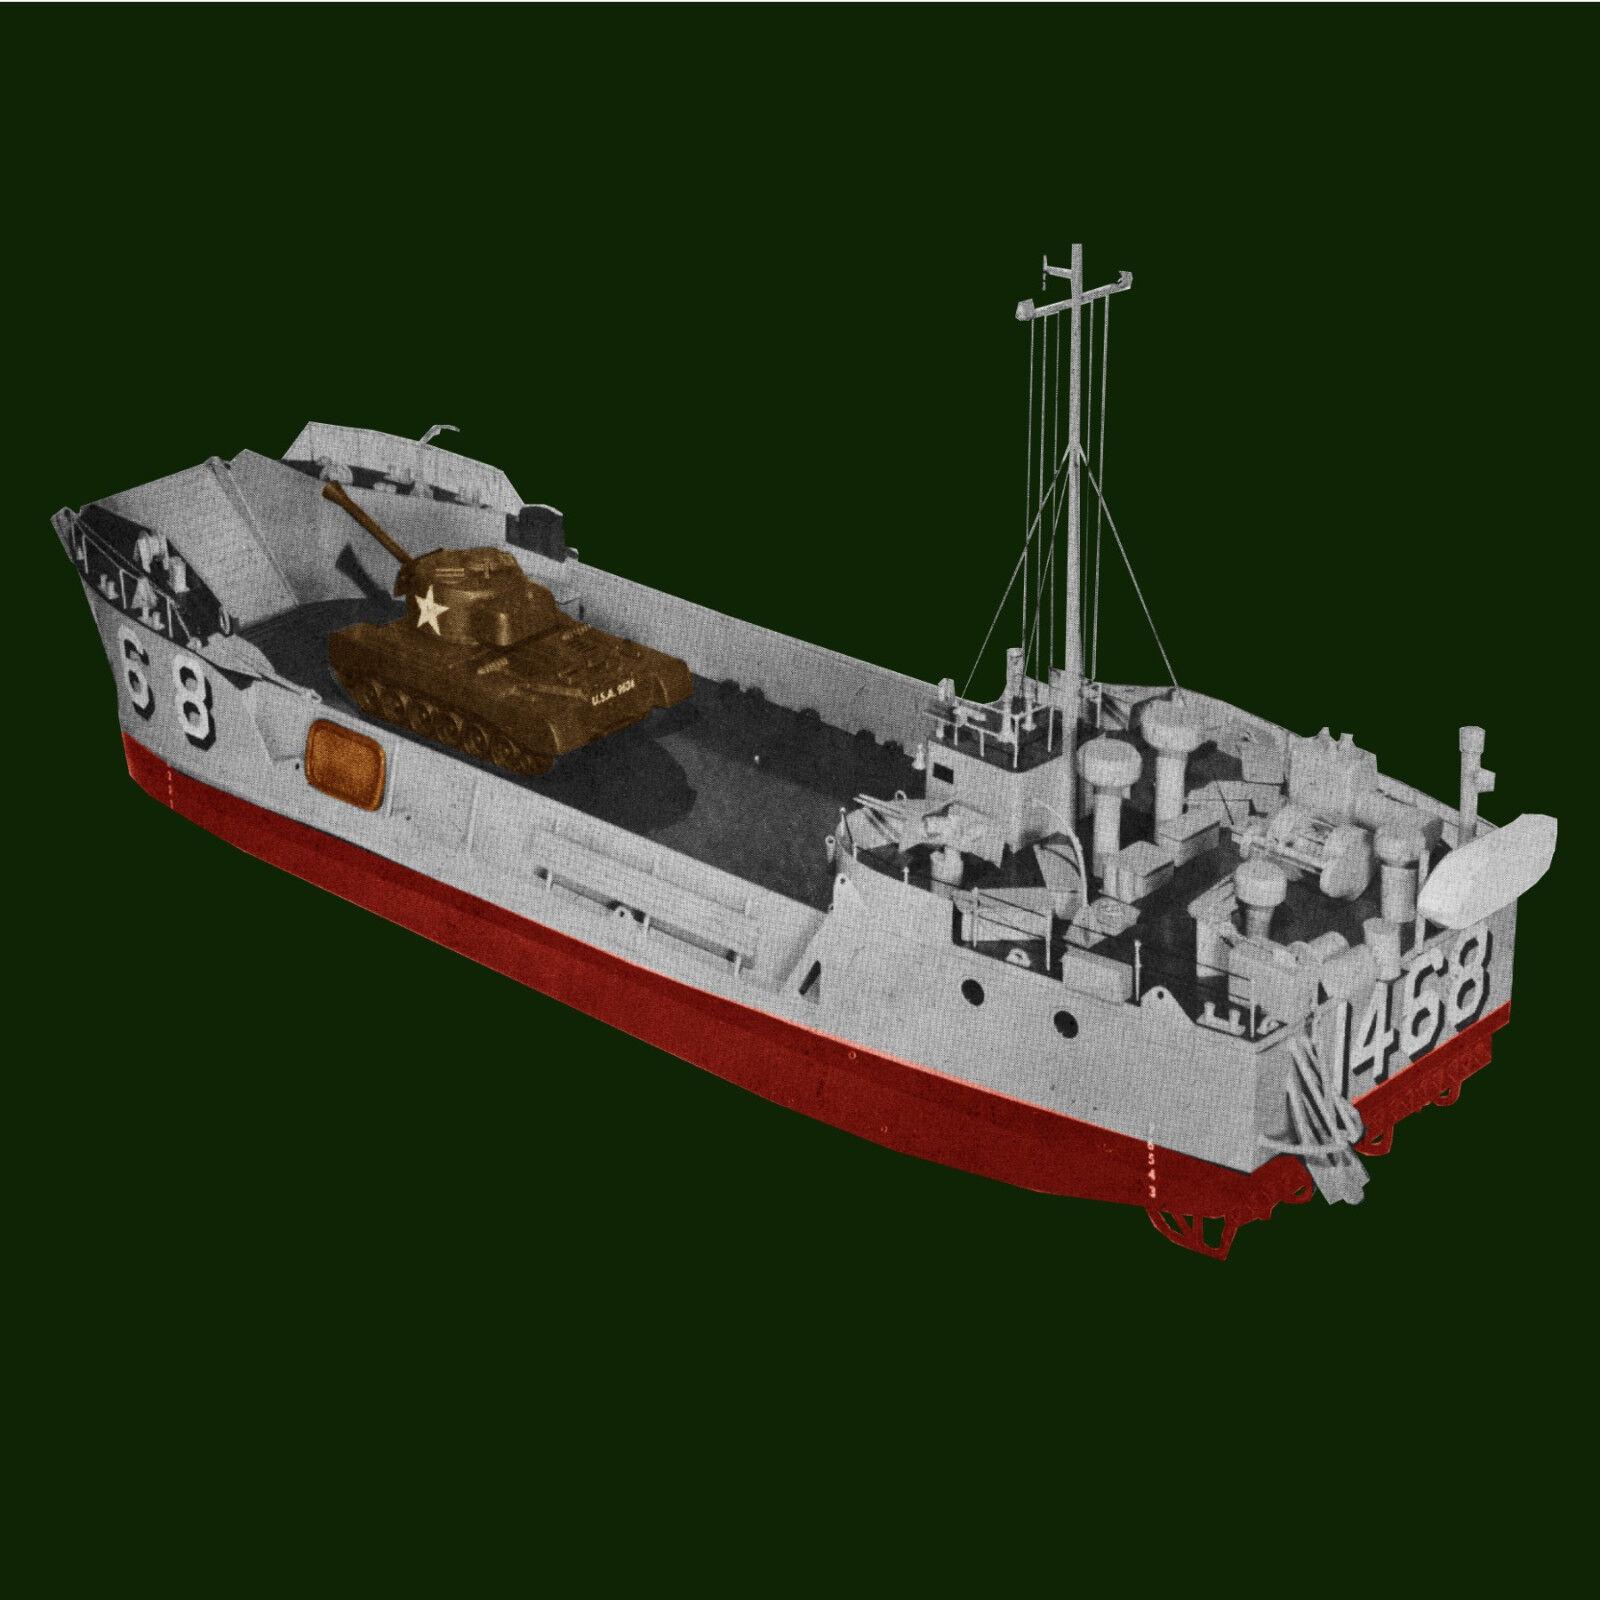 RC Model Boat Plans Free additionally Radio Control Model Boat Plans ...